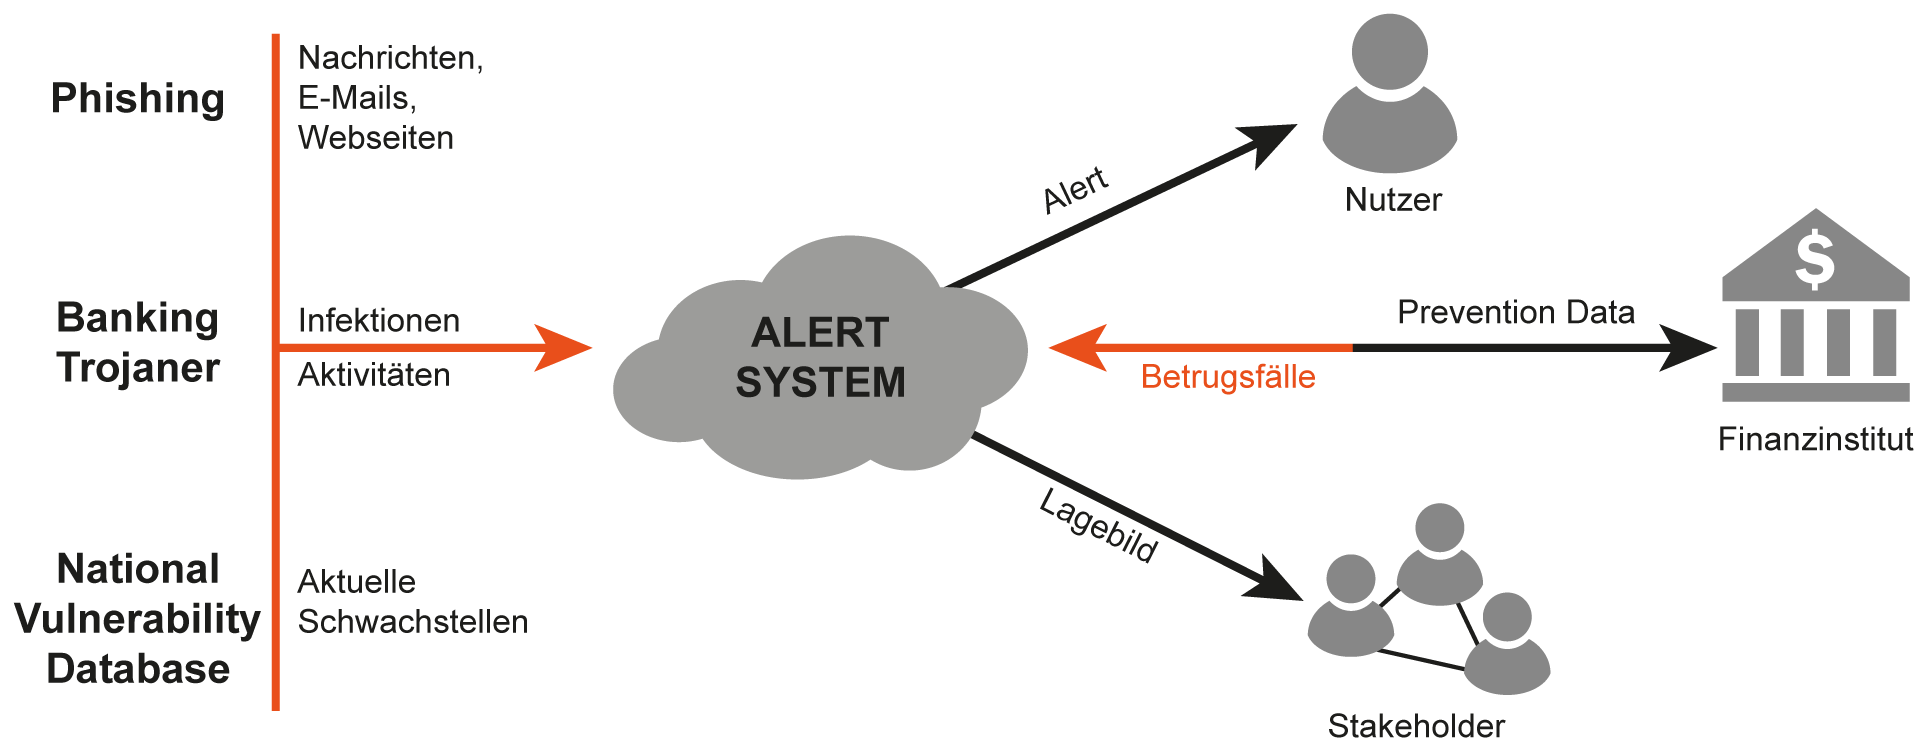 Maschinelles Lernen - Betrugsschutz im Online-Banking - Glossar- Cyber-Sicherheit - Prof. Norbert Pohlmann